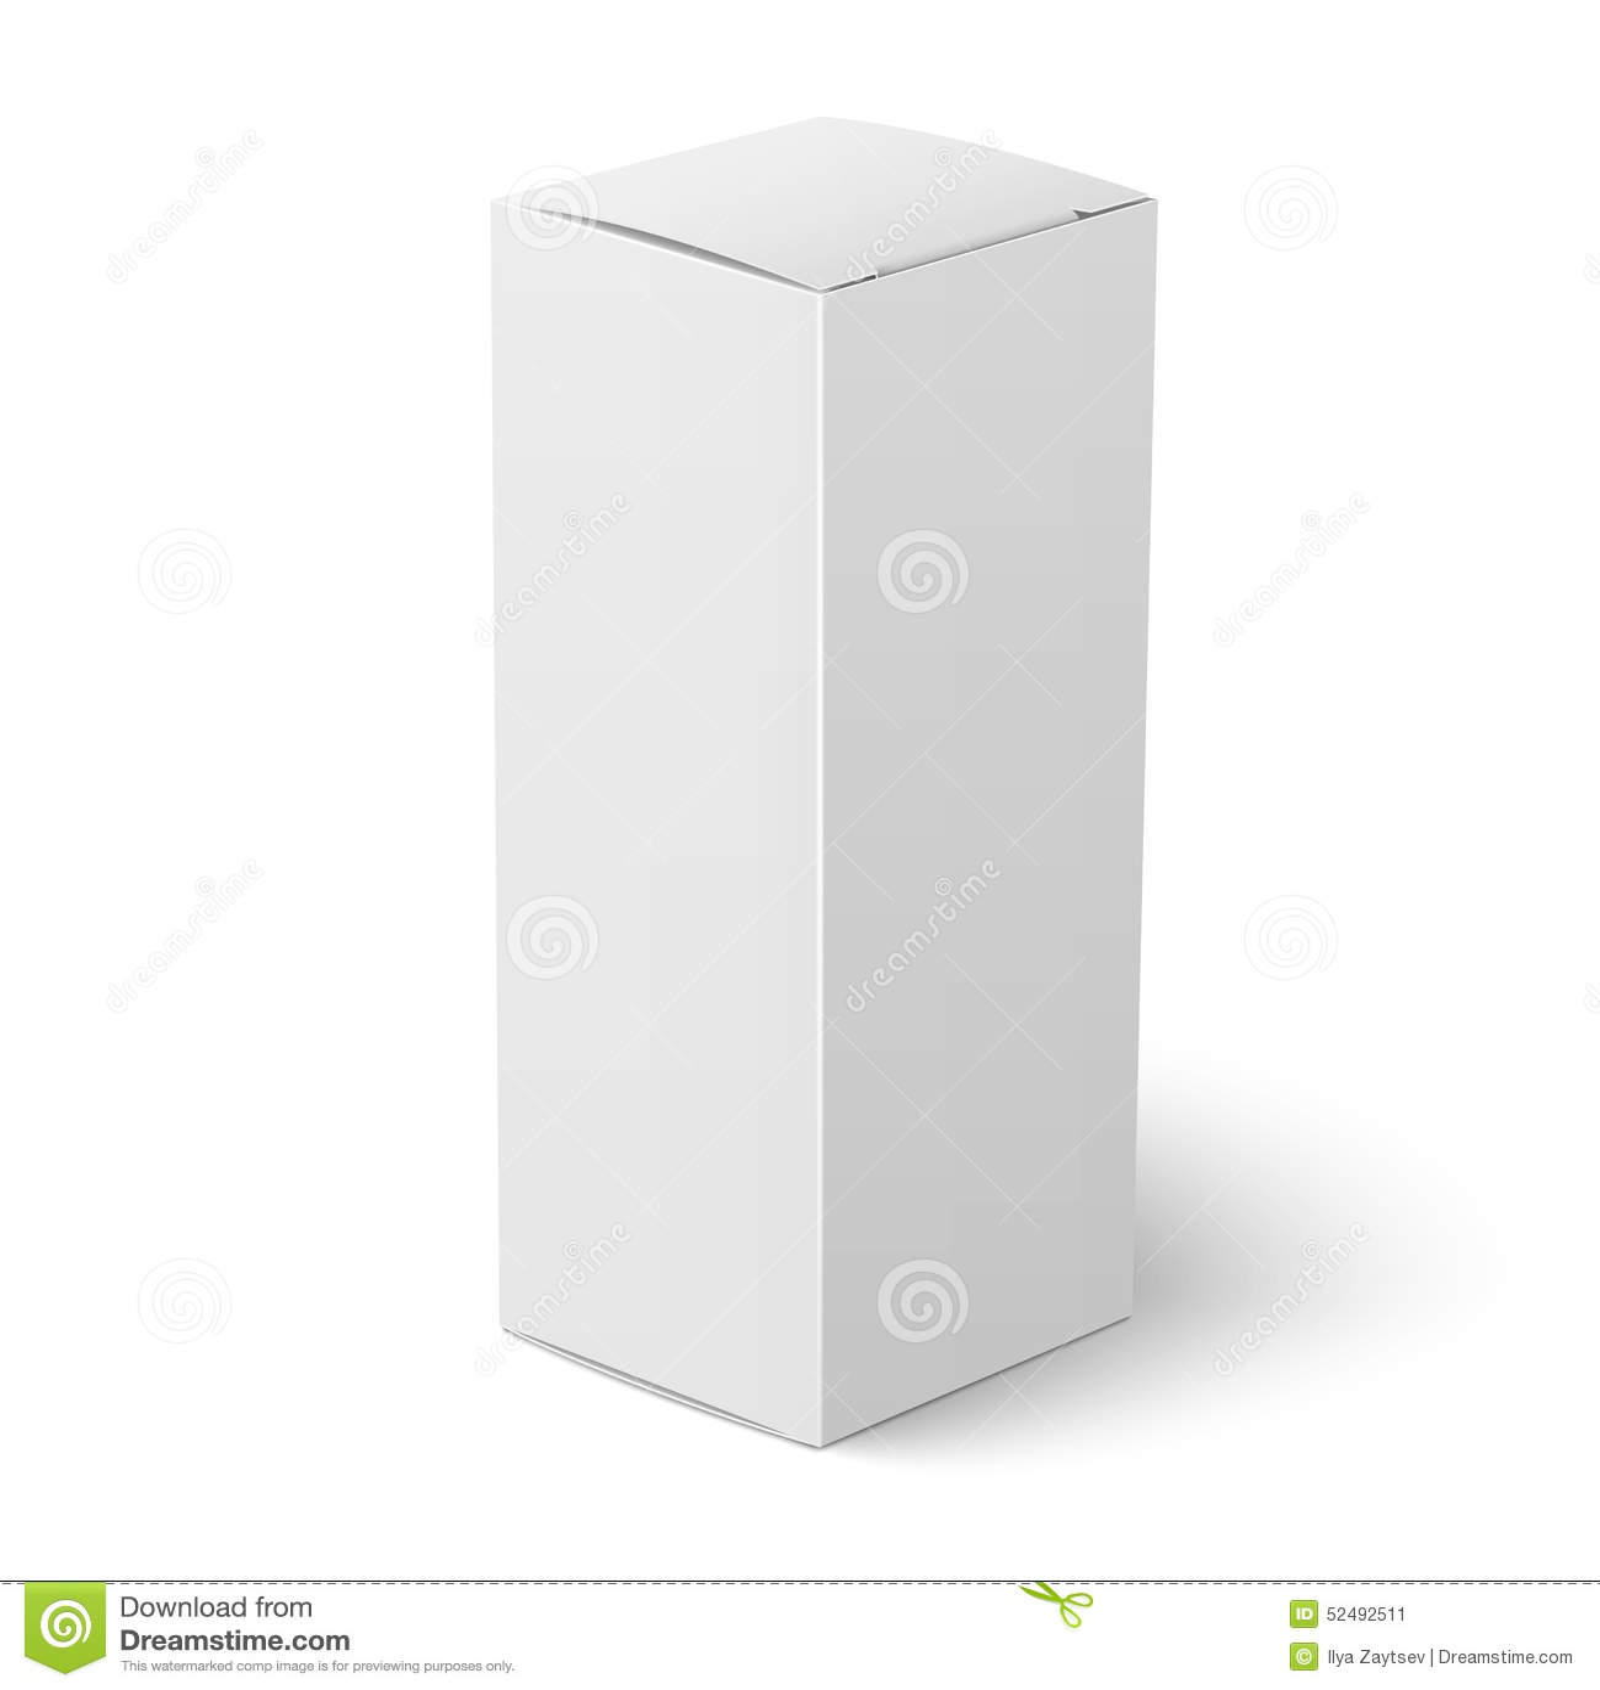 White vertical paper box template stock vector illustration of white vertical paper box template maxwellsz